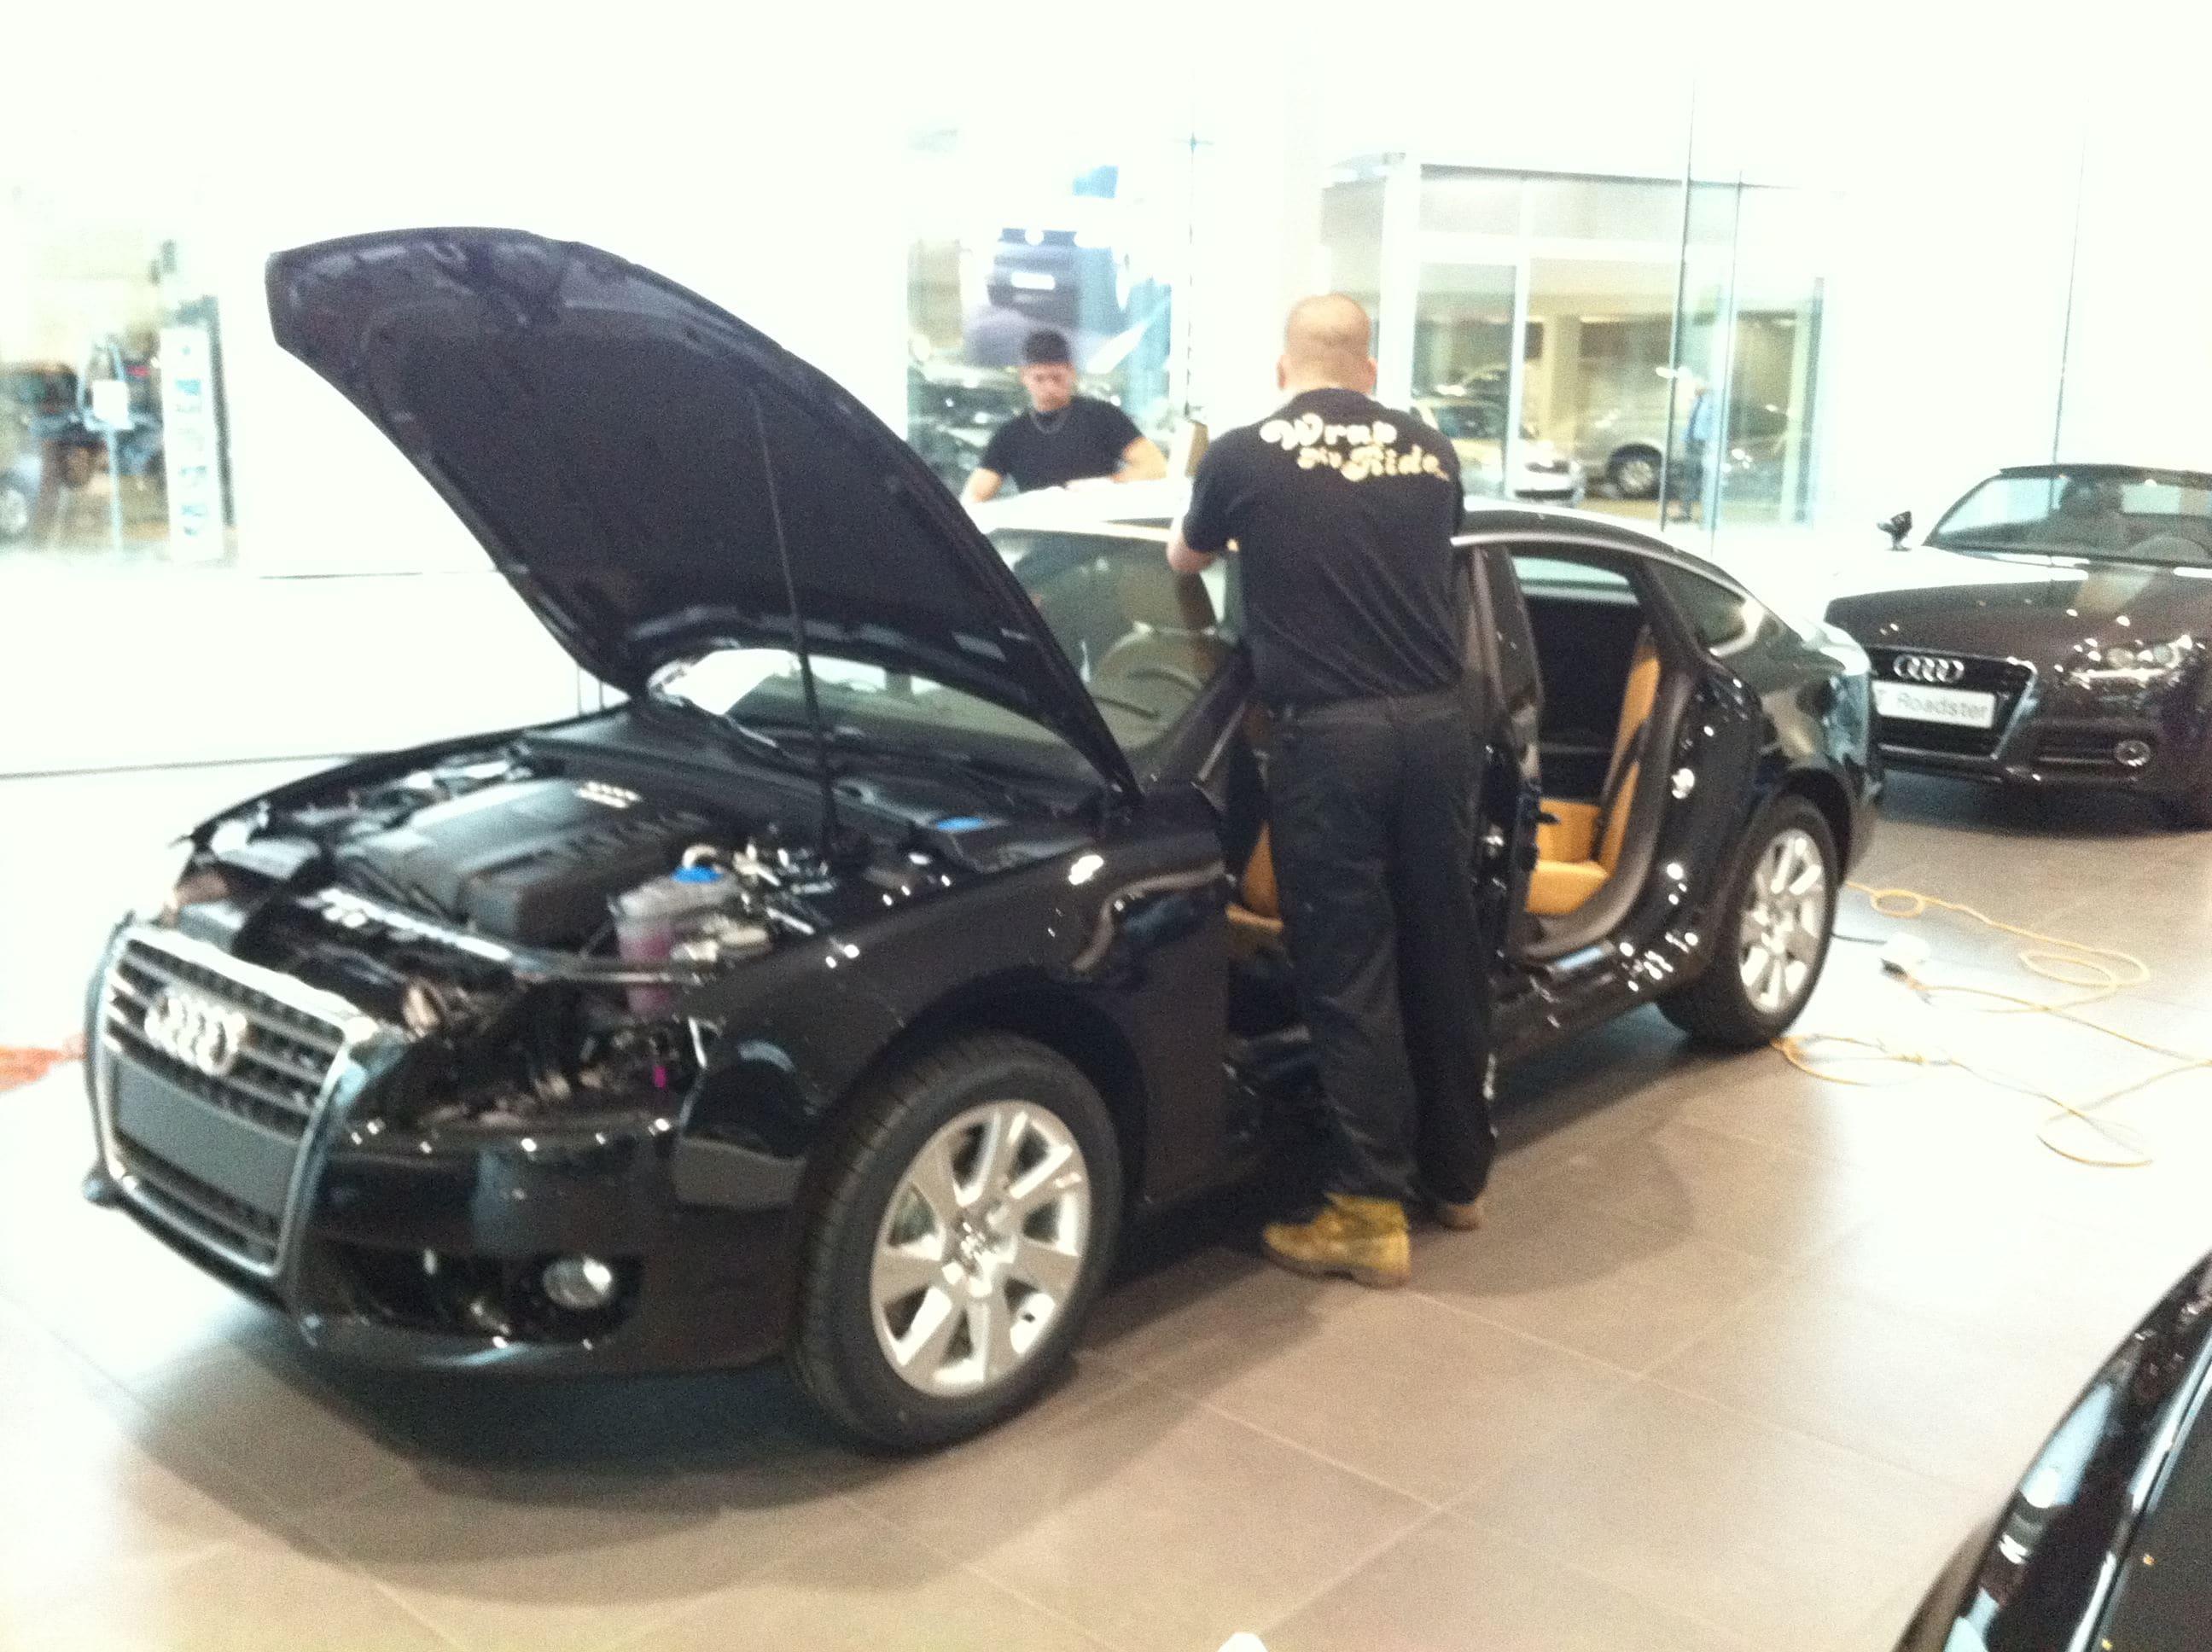 Audi A5 Sportback met Mat Grijze Wrap, Carwrapping door Wrapmyride.nu Foto-nr:4758, ©2021